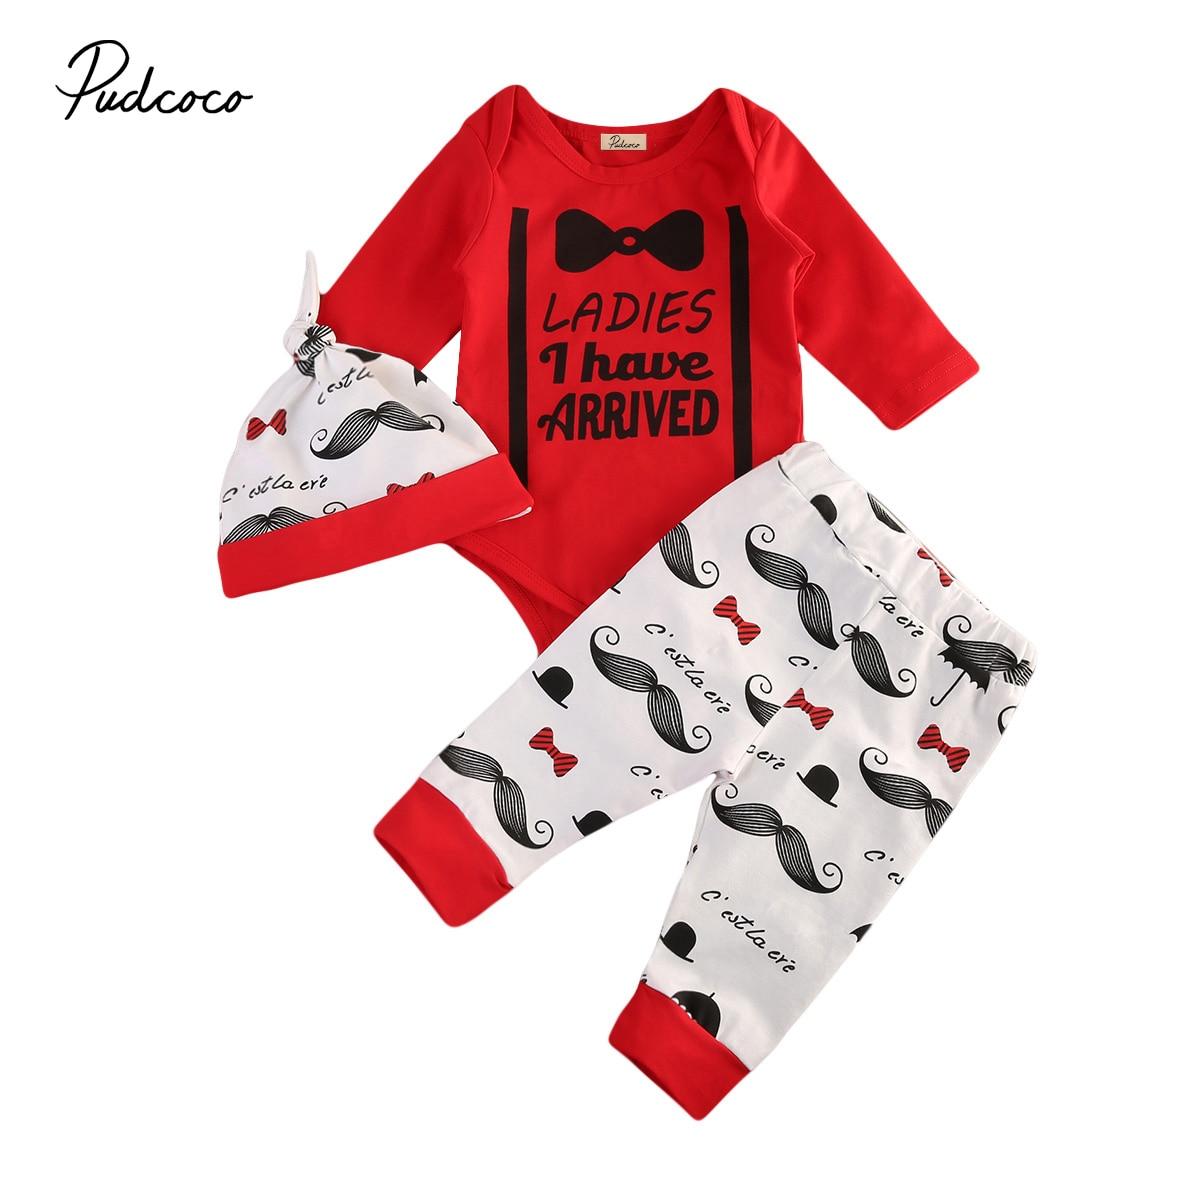 Pudcoco 3Pcs Newborn Baby Boys Gentleman Cotton Long Sleeve O-Neck Bodysuit Pants Hat Outfits Set 0-24Months Helen115